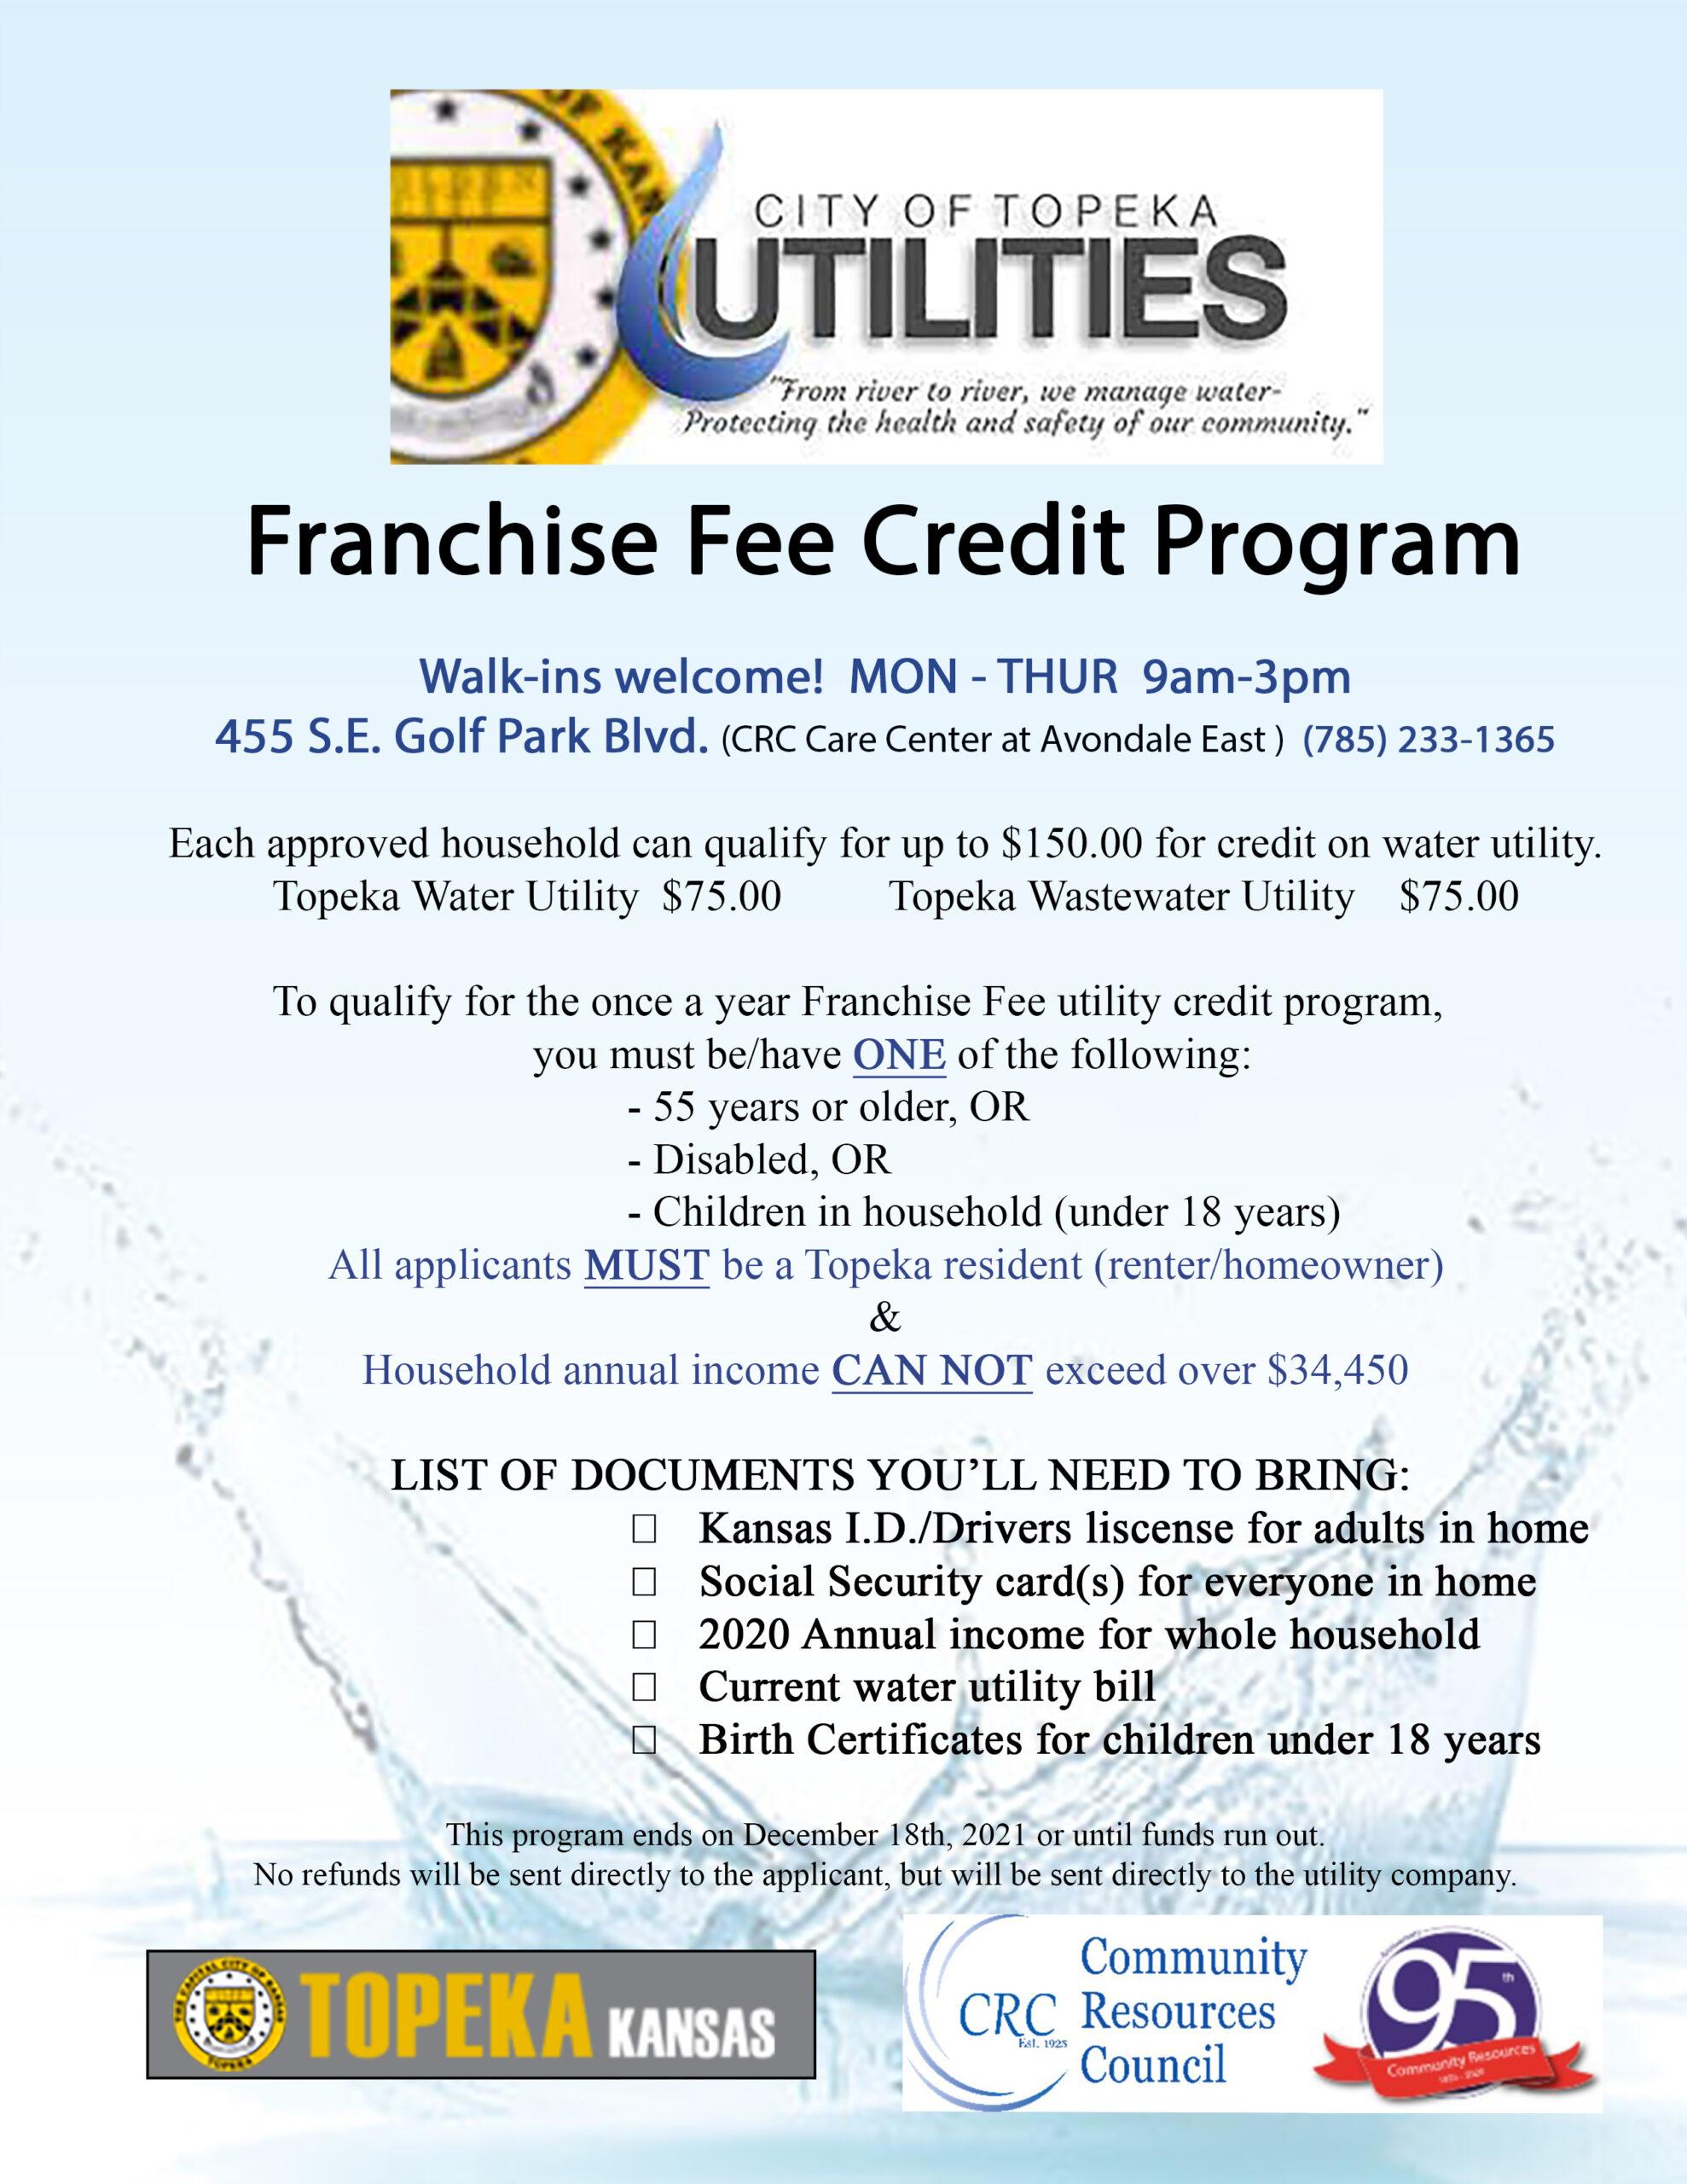 Franchise Fee Credit Program